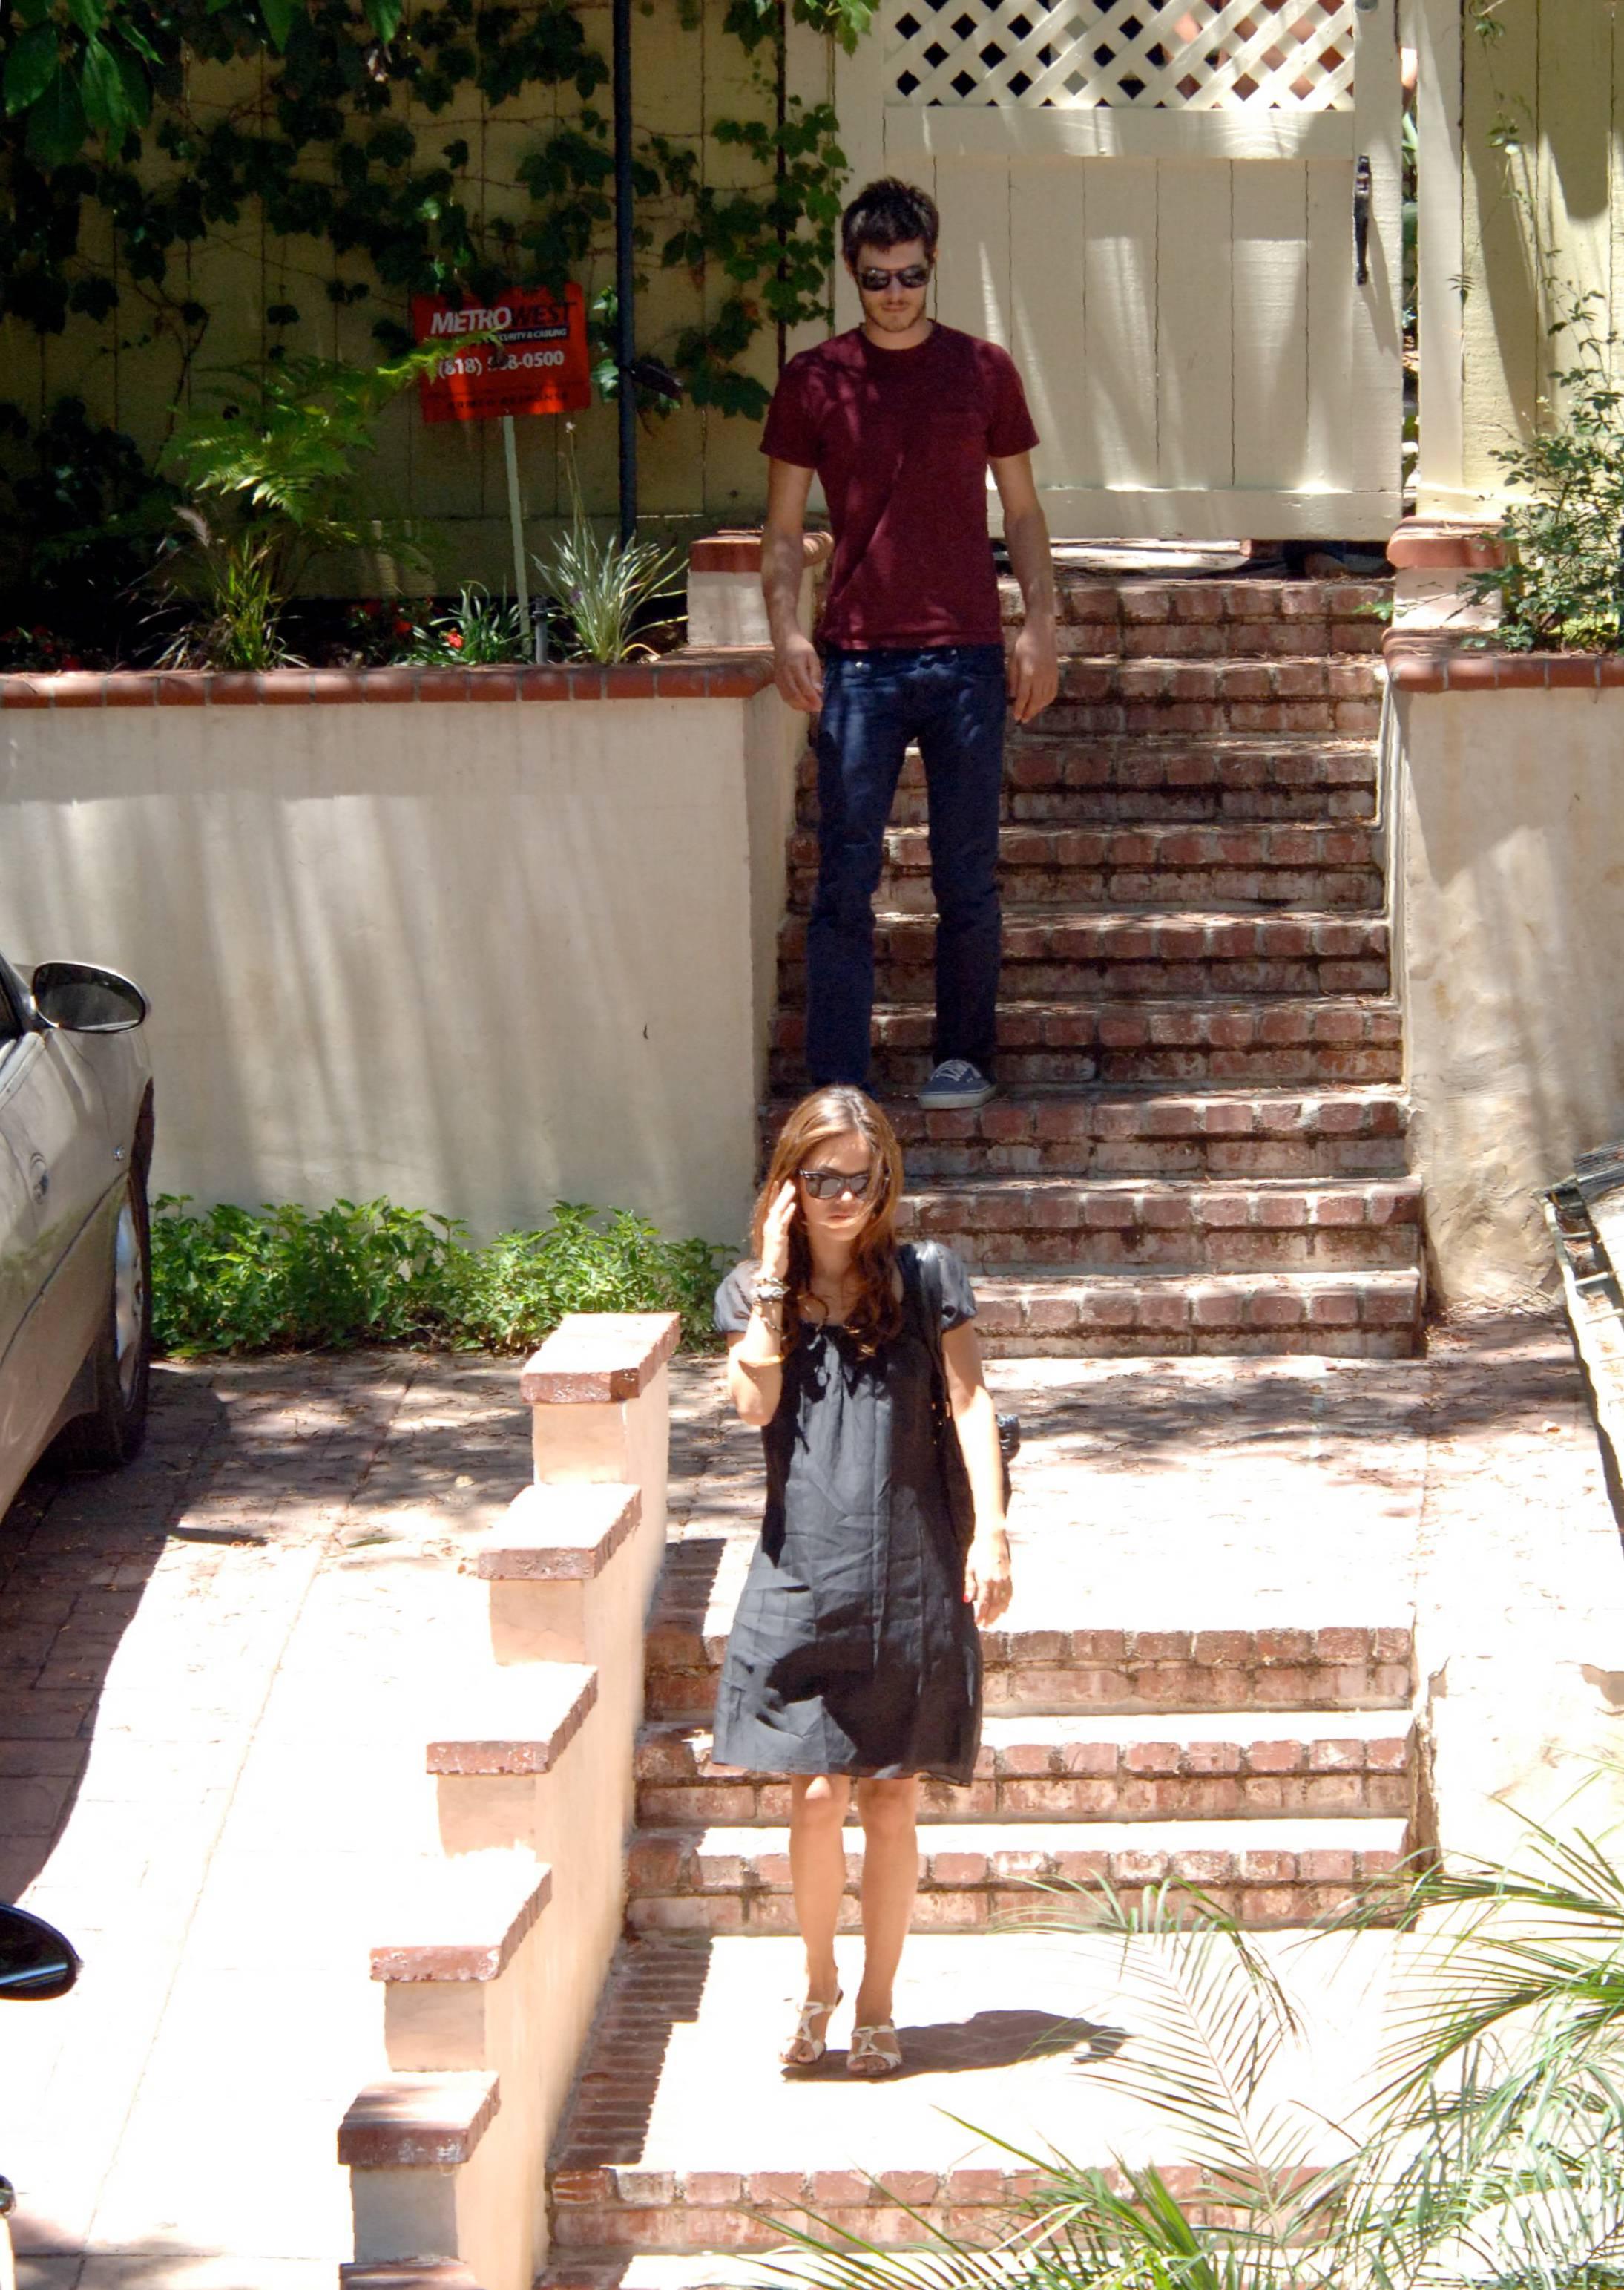 73085_Rachel_Bilson_with_her_sister_in_Hollywood_03_453lo.jpg